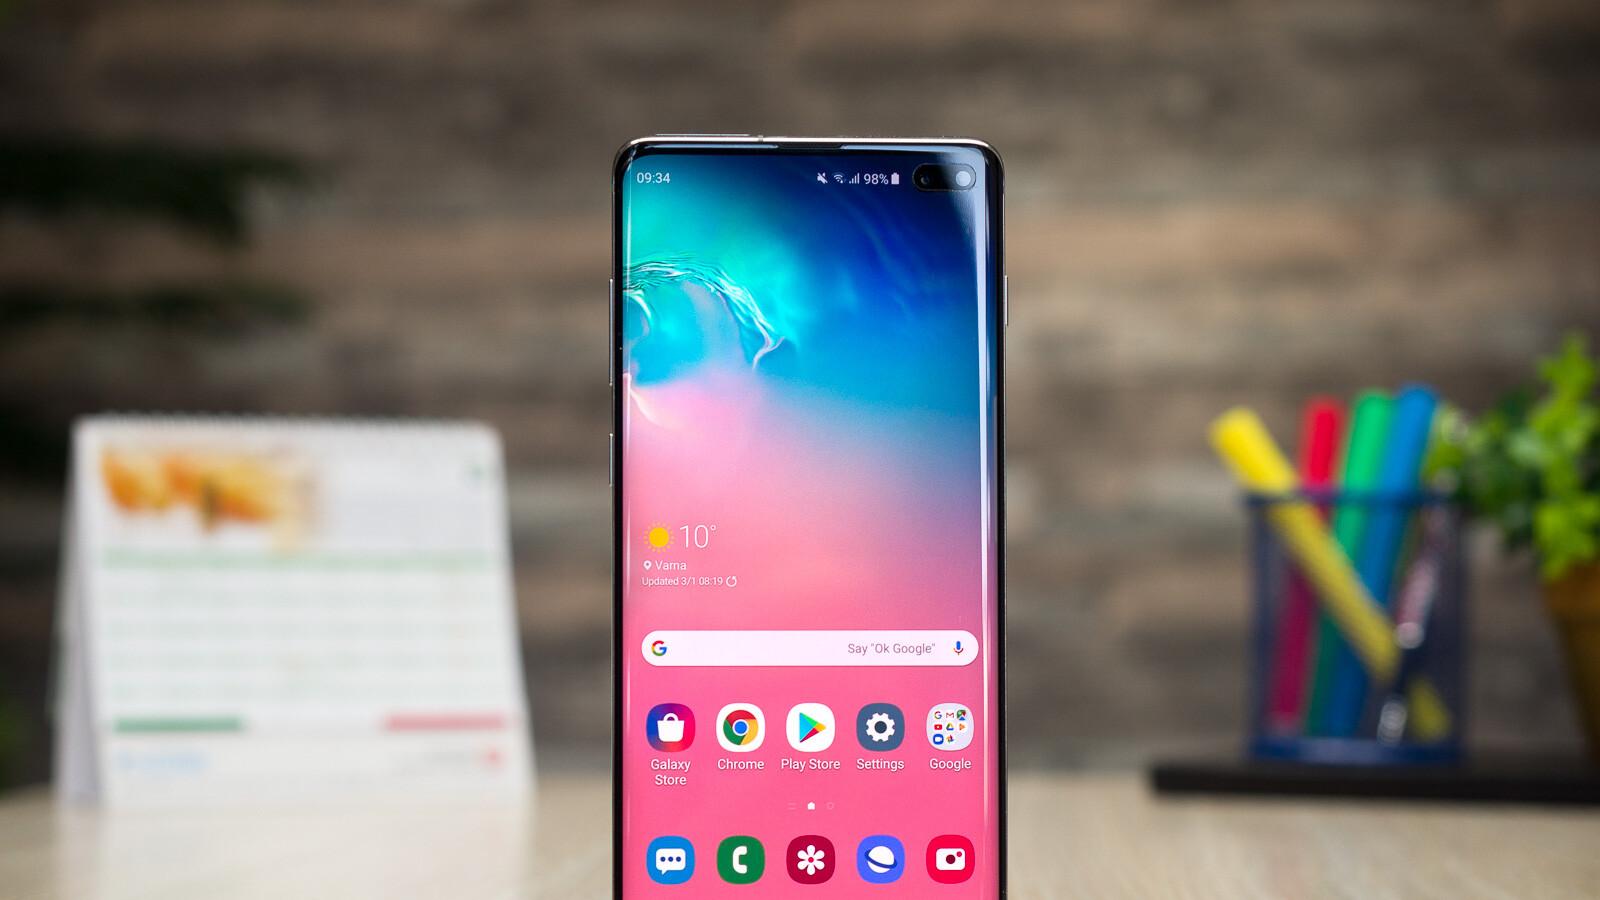 Hot Alert A Wallpaper Is Crashing Android Phones Especially Samsung Phones